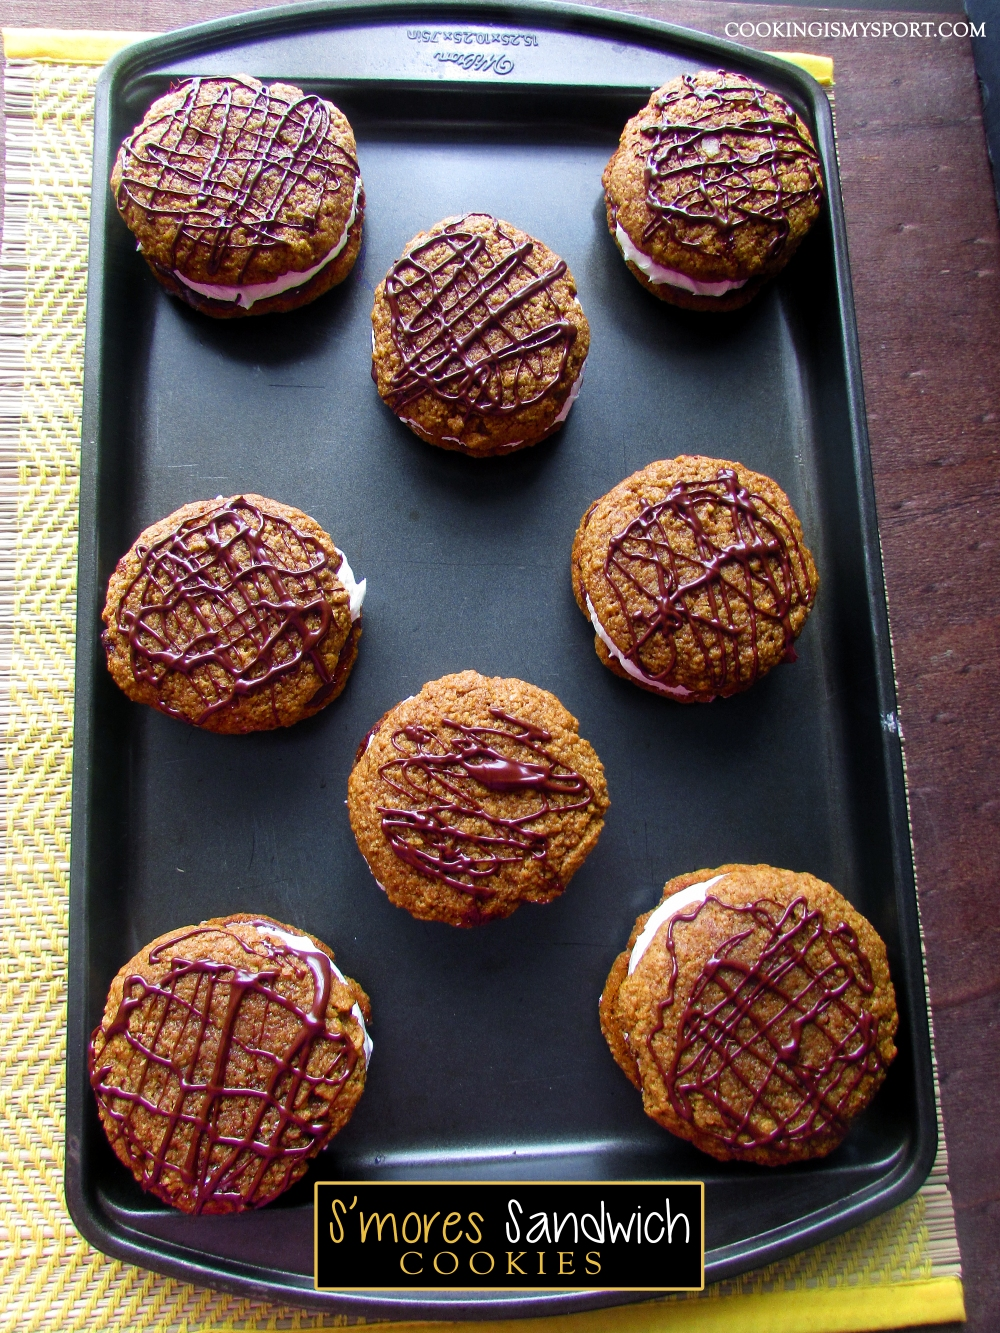 S'mores Sandwich Cookies4